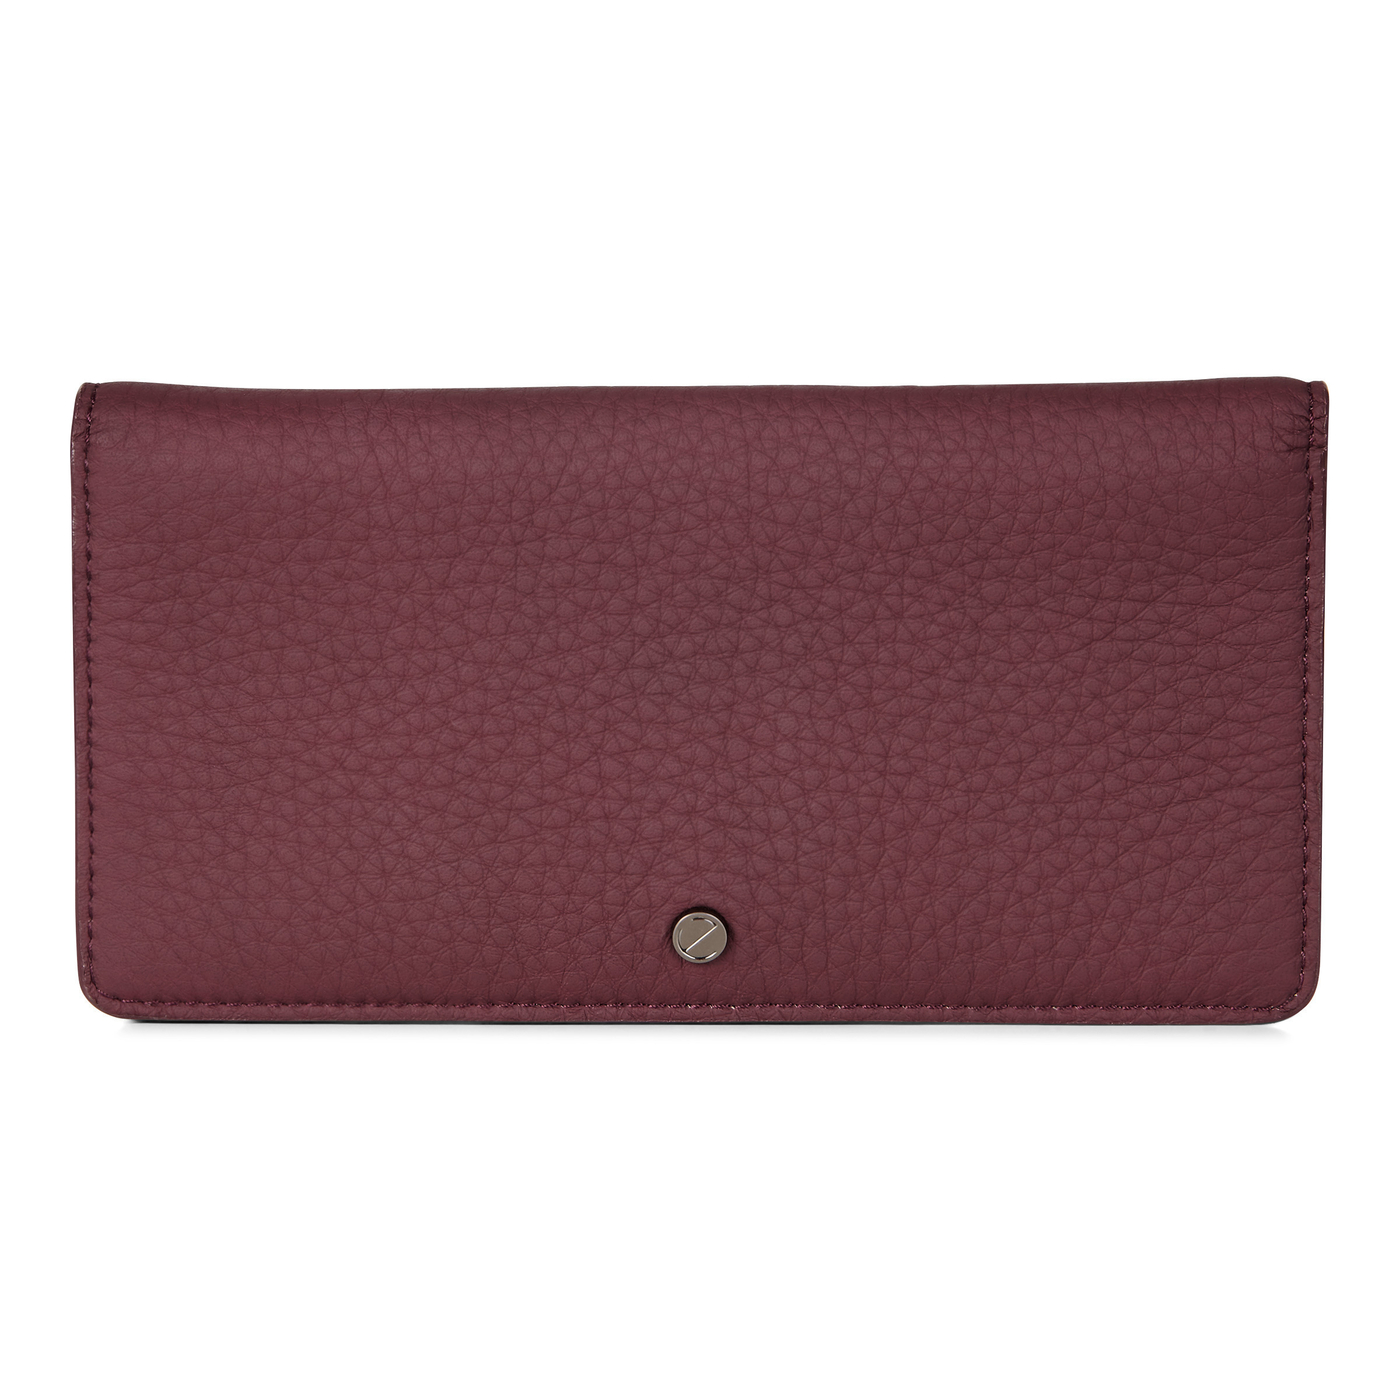 ECCO JILIN TANDEM Large Travel Wallet